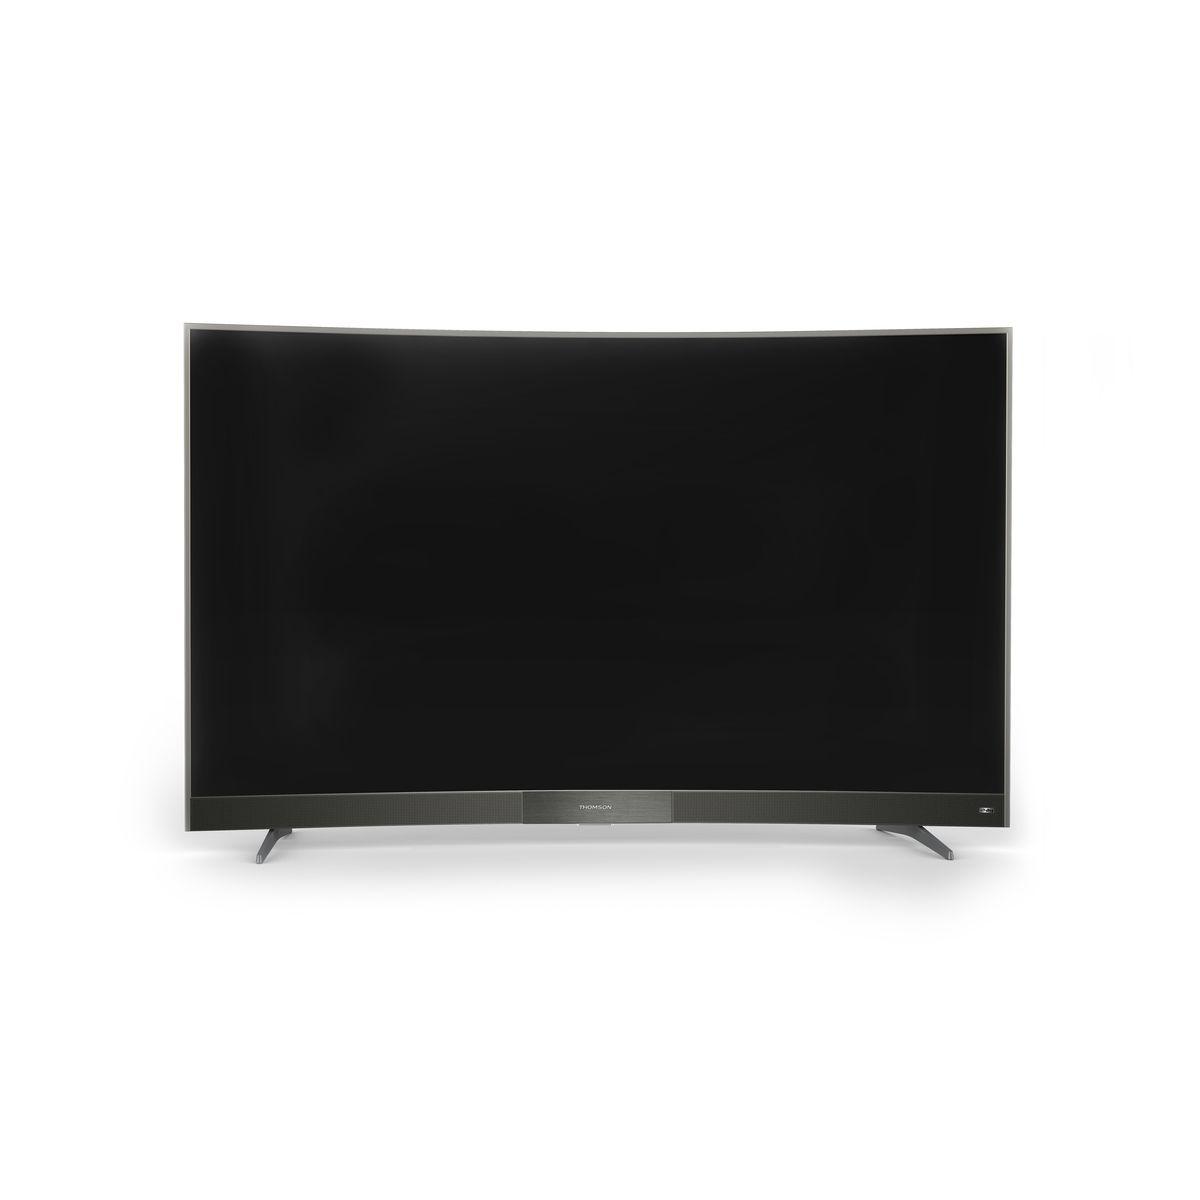 t l viseur ultra hd 4k 139 cm thomson 55uc6406 comparer les prix sur shopoonet. Black Bedroom Furniture Sets. Home Design Ideas